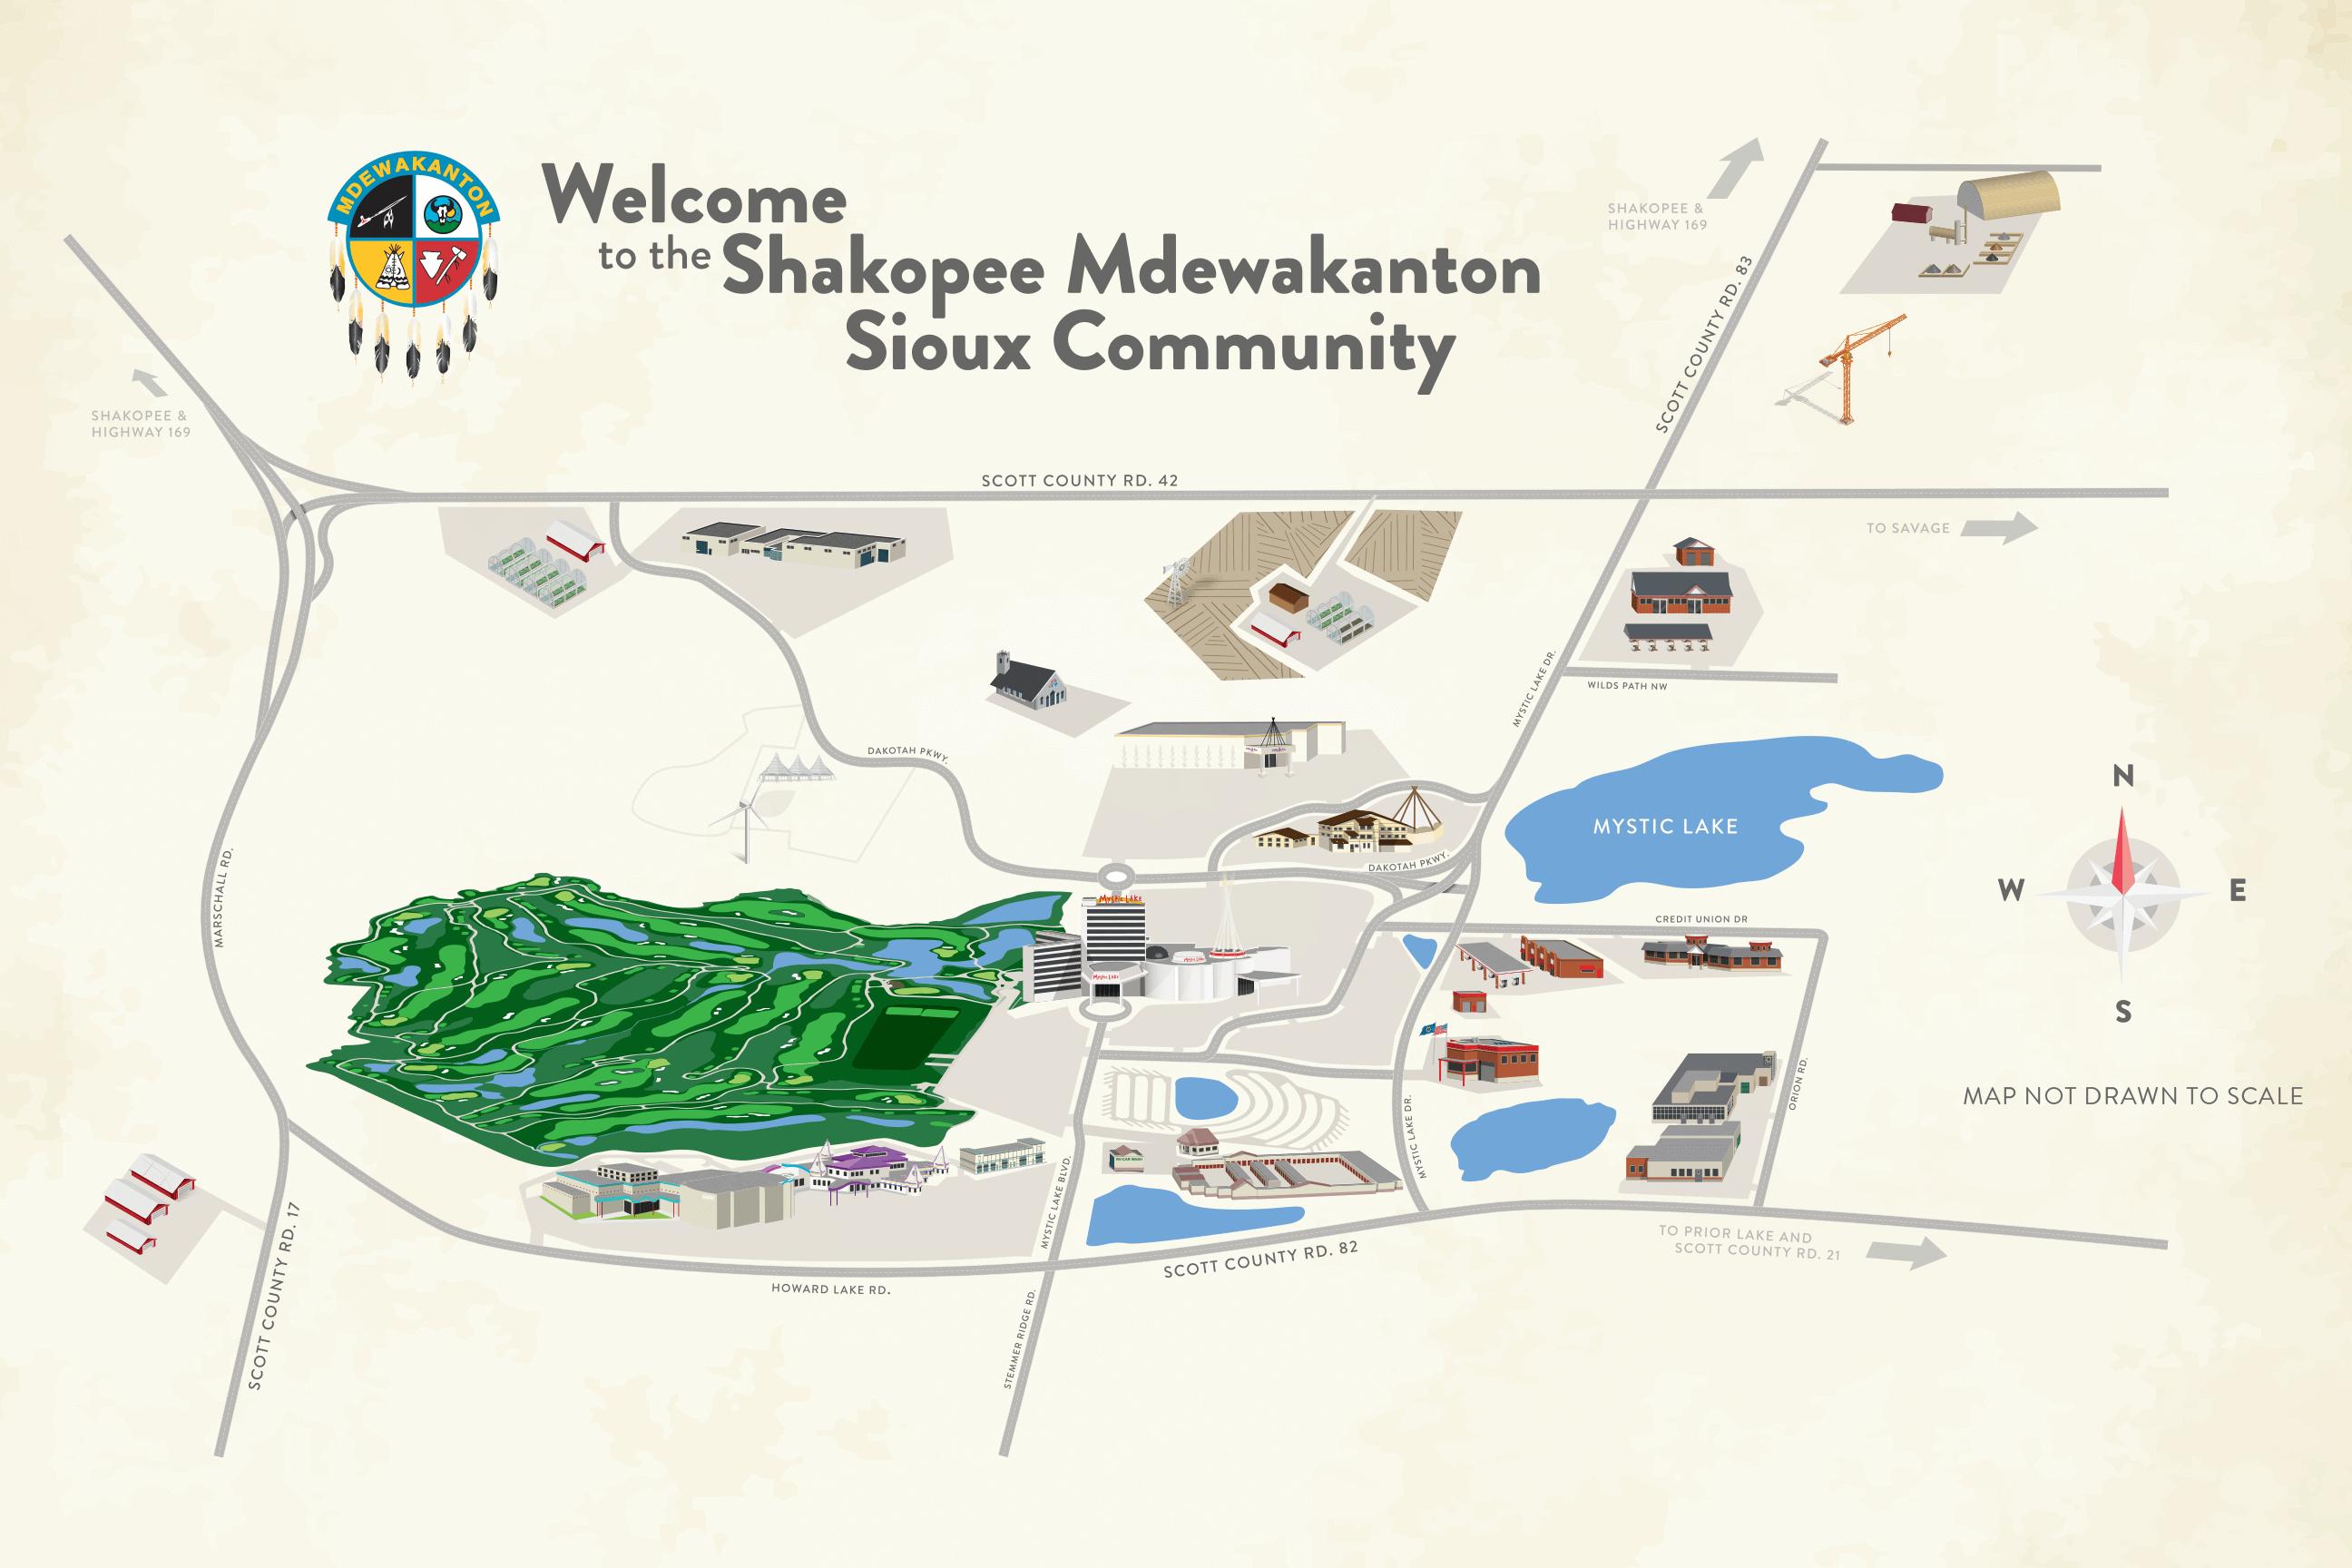 Shakopee Mdewakanton Sioux Community Map, Prior Lake MN